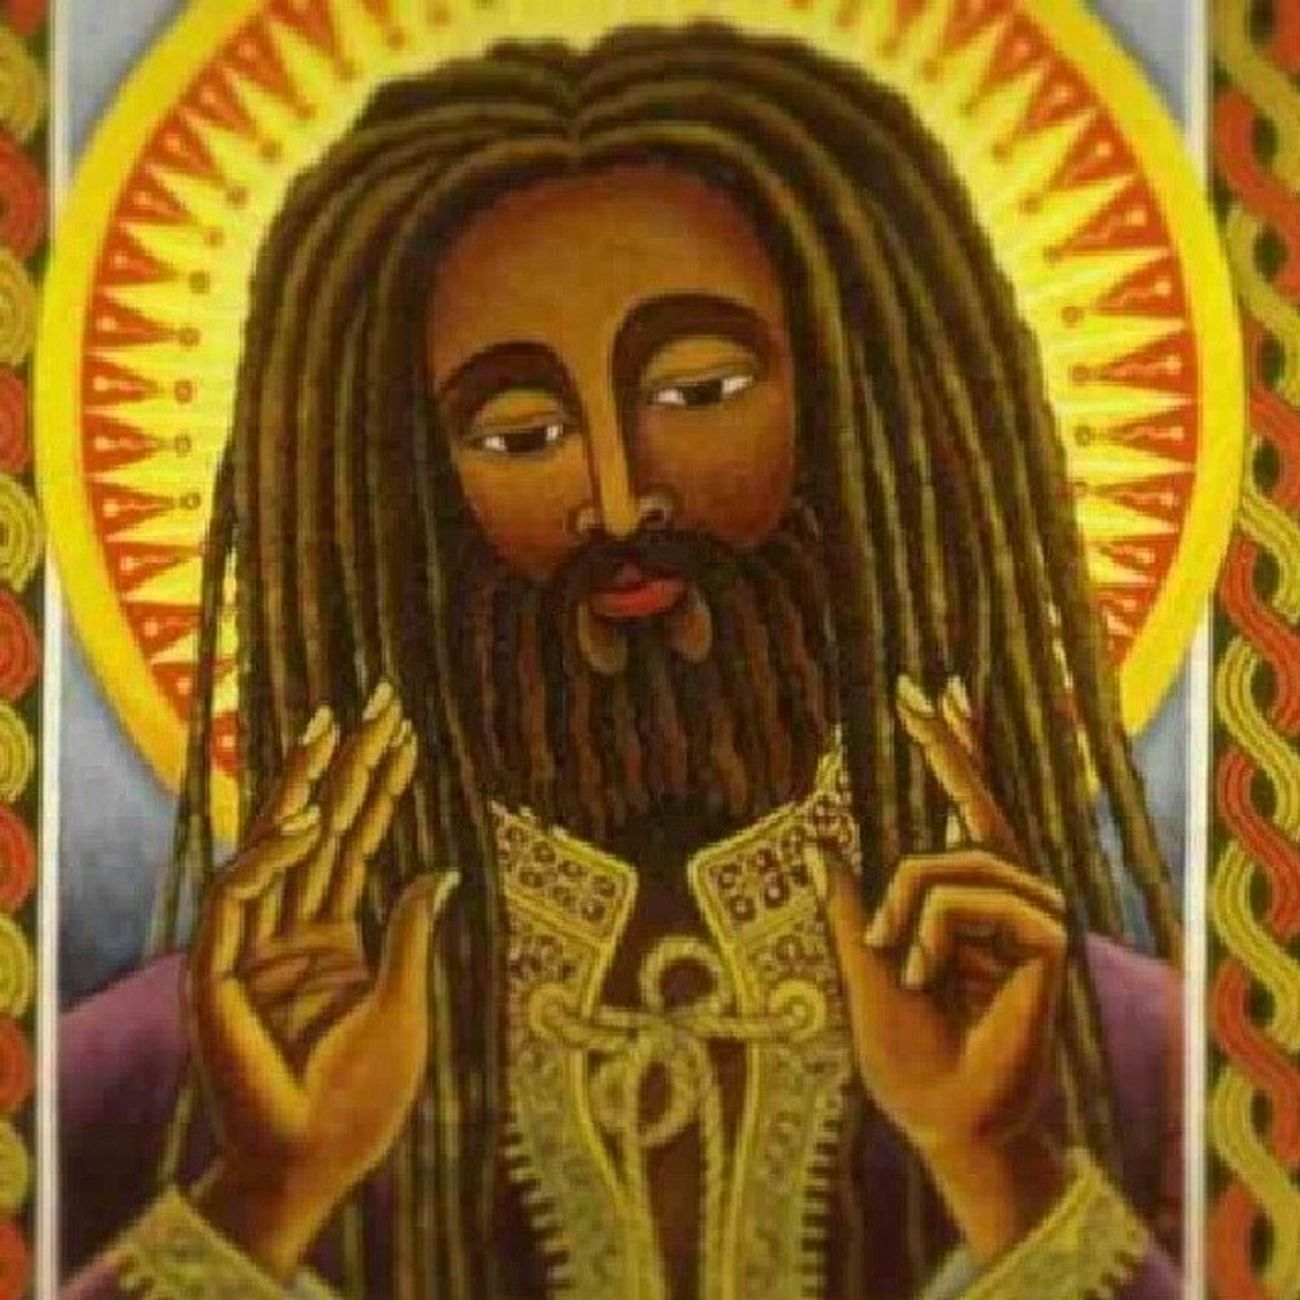 Jah Bless INI Foreverlovingjah rastafari